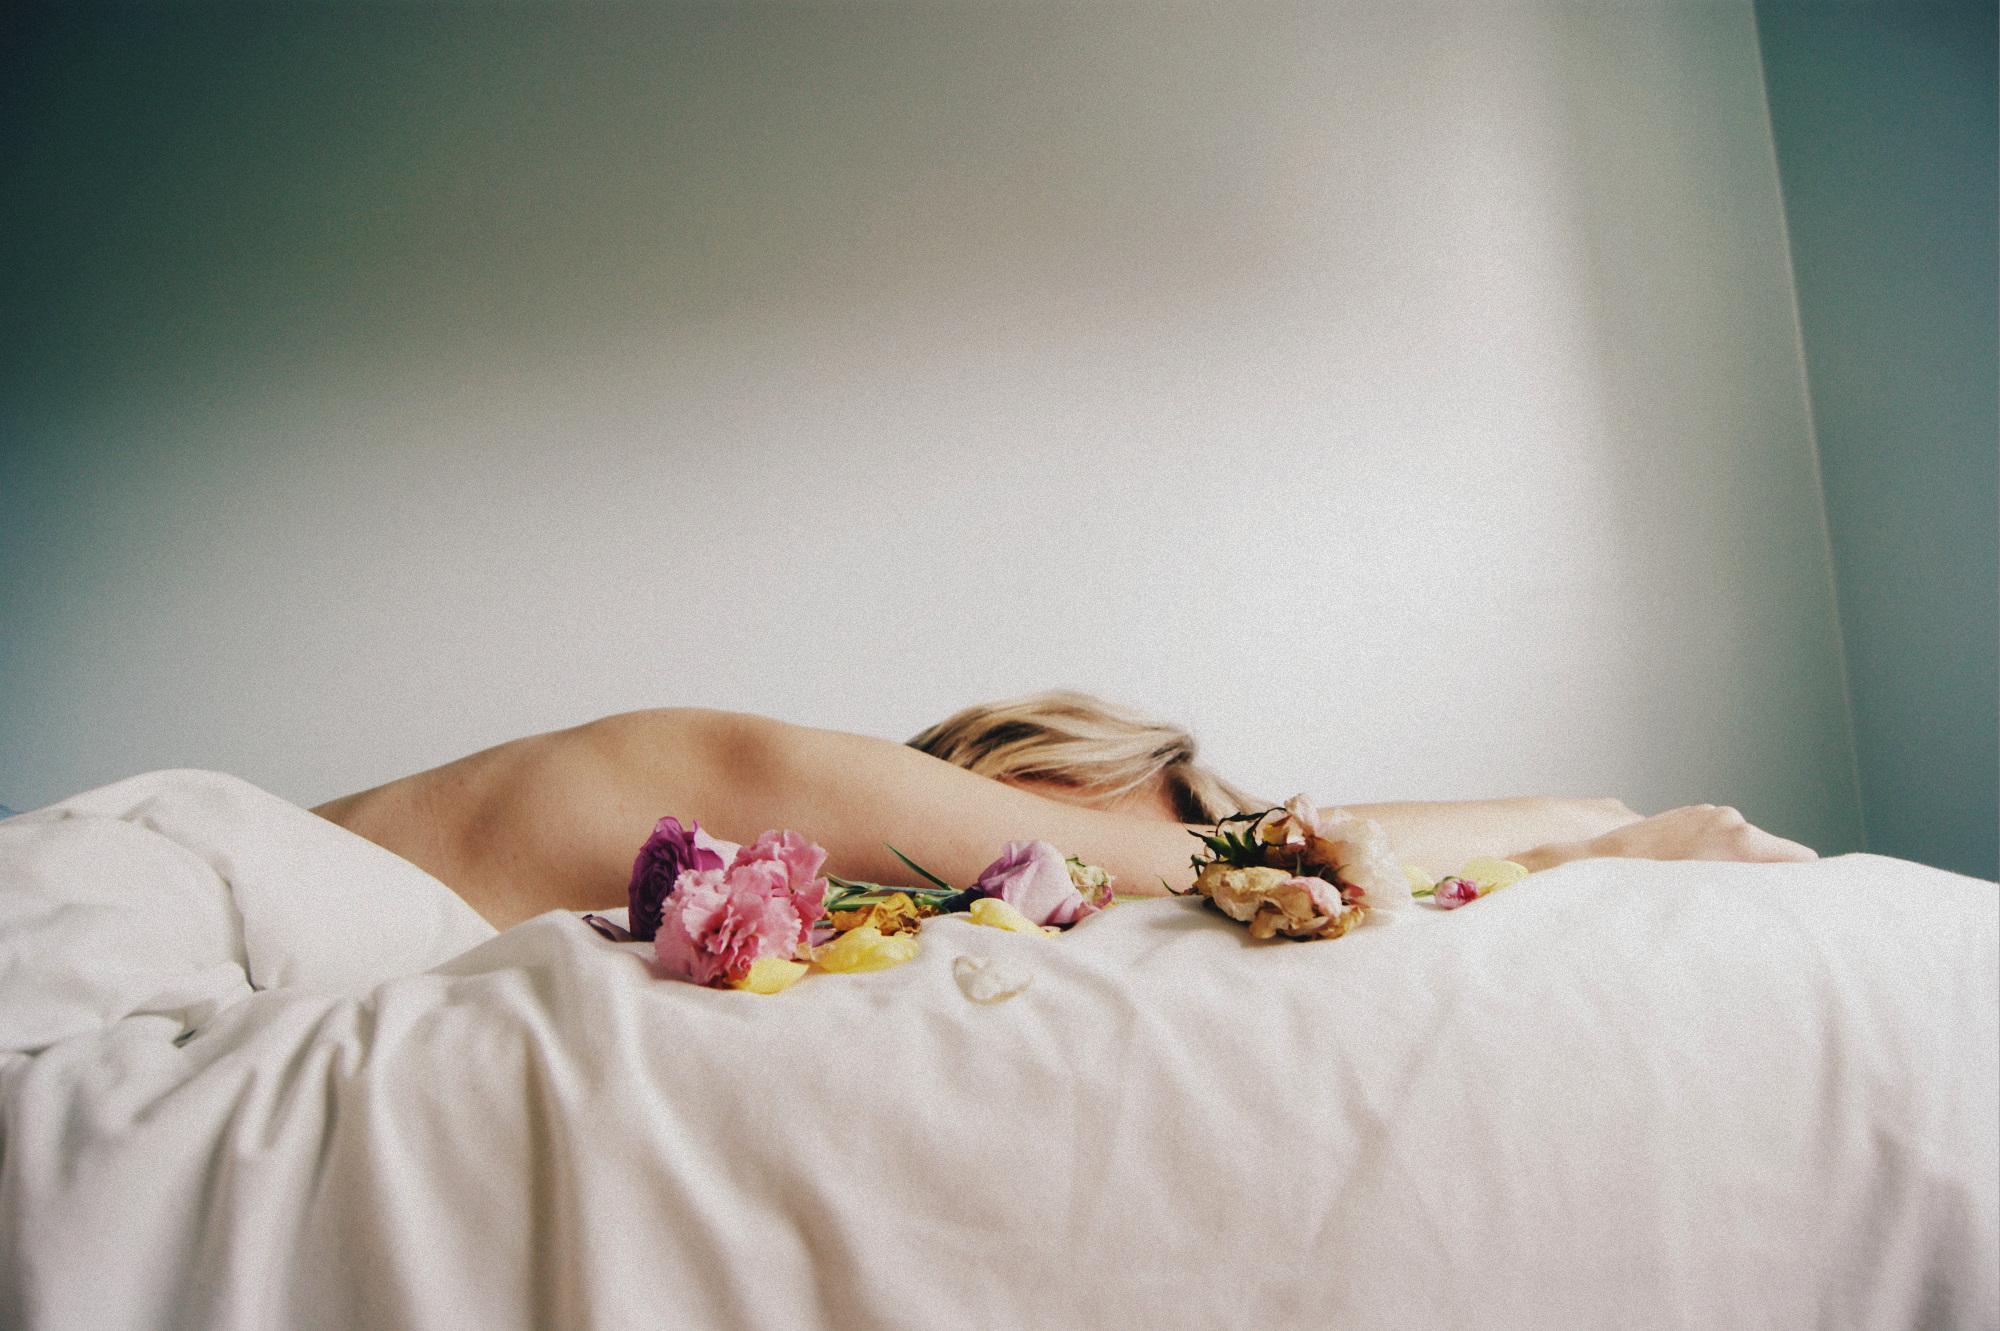 Картинка девушка утром спит